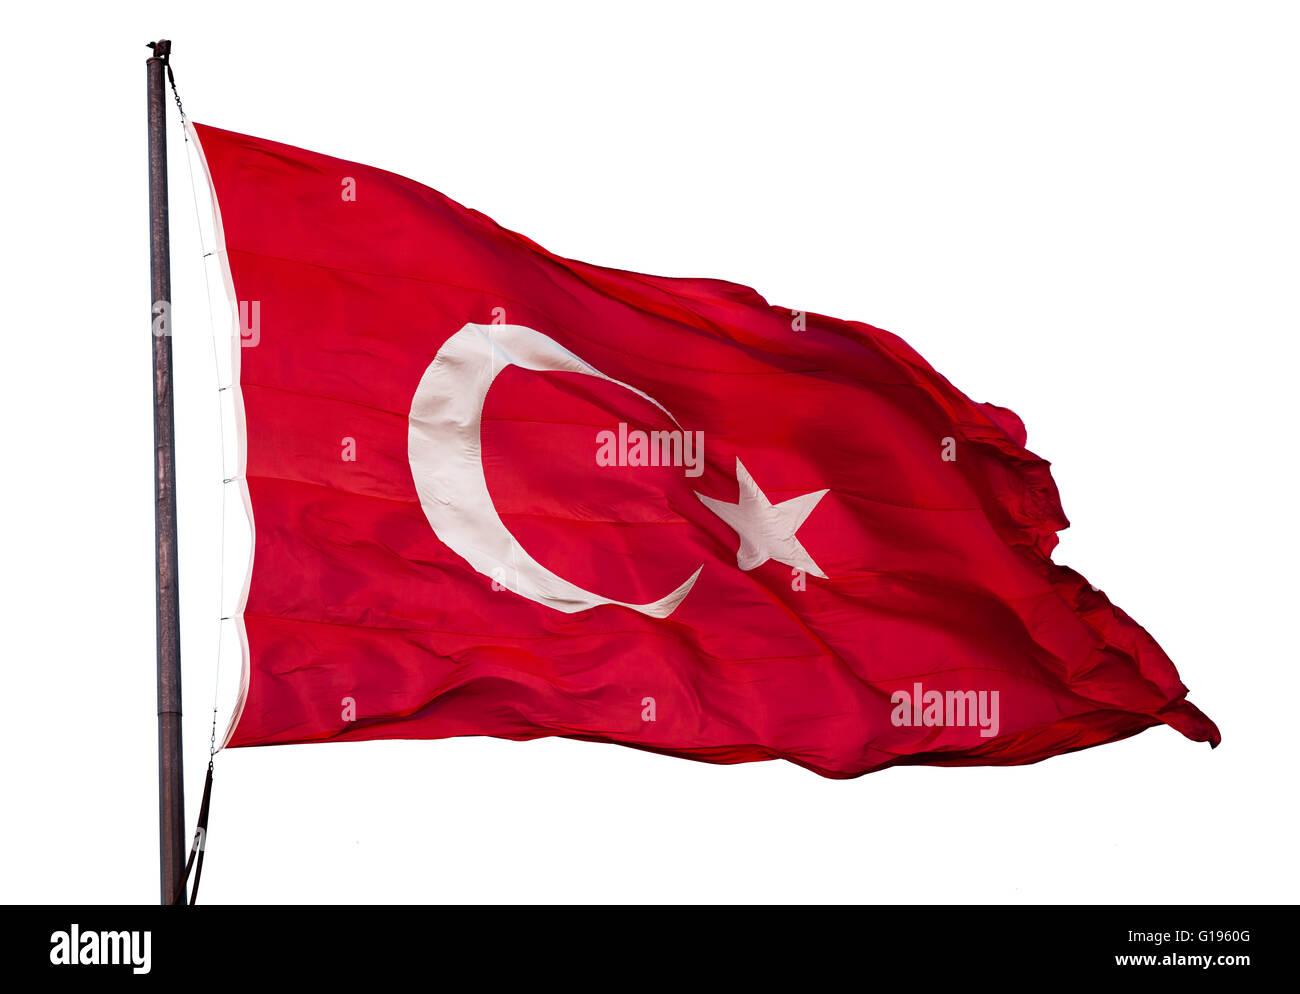 Turkish flag - Stock Image